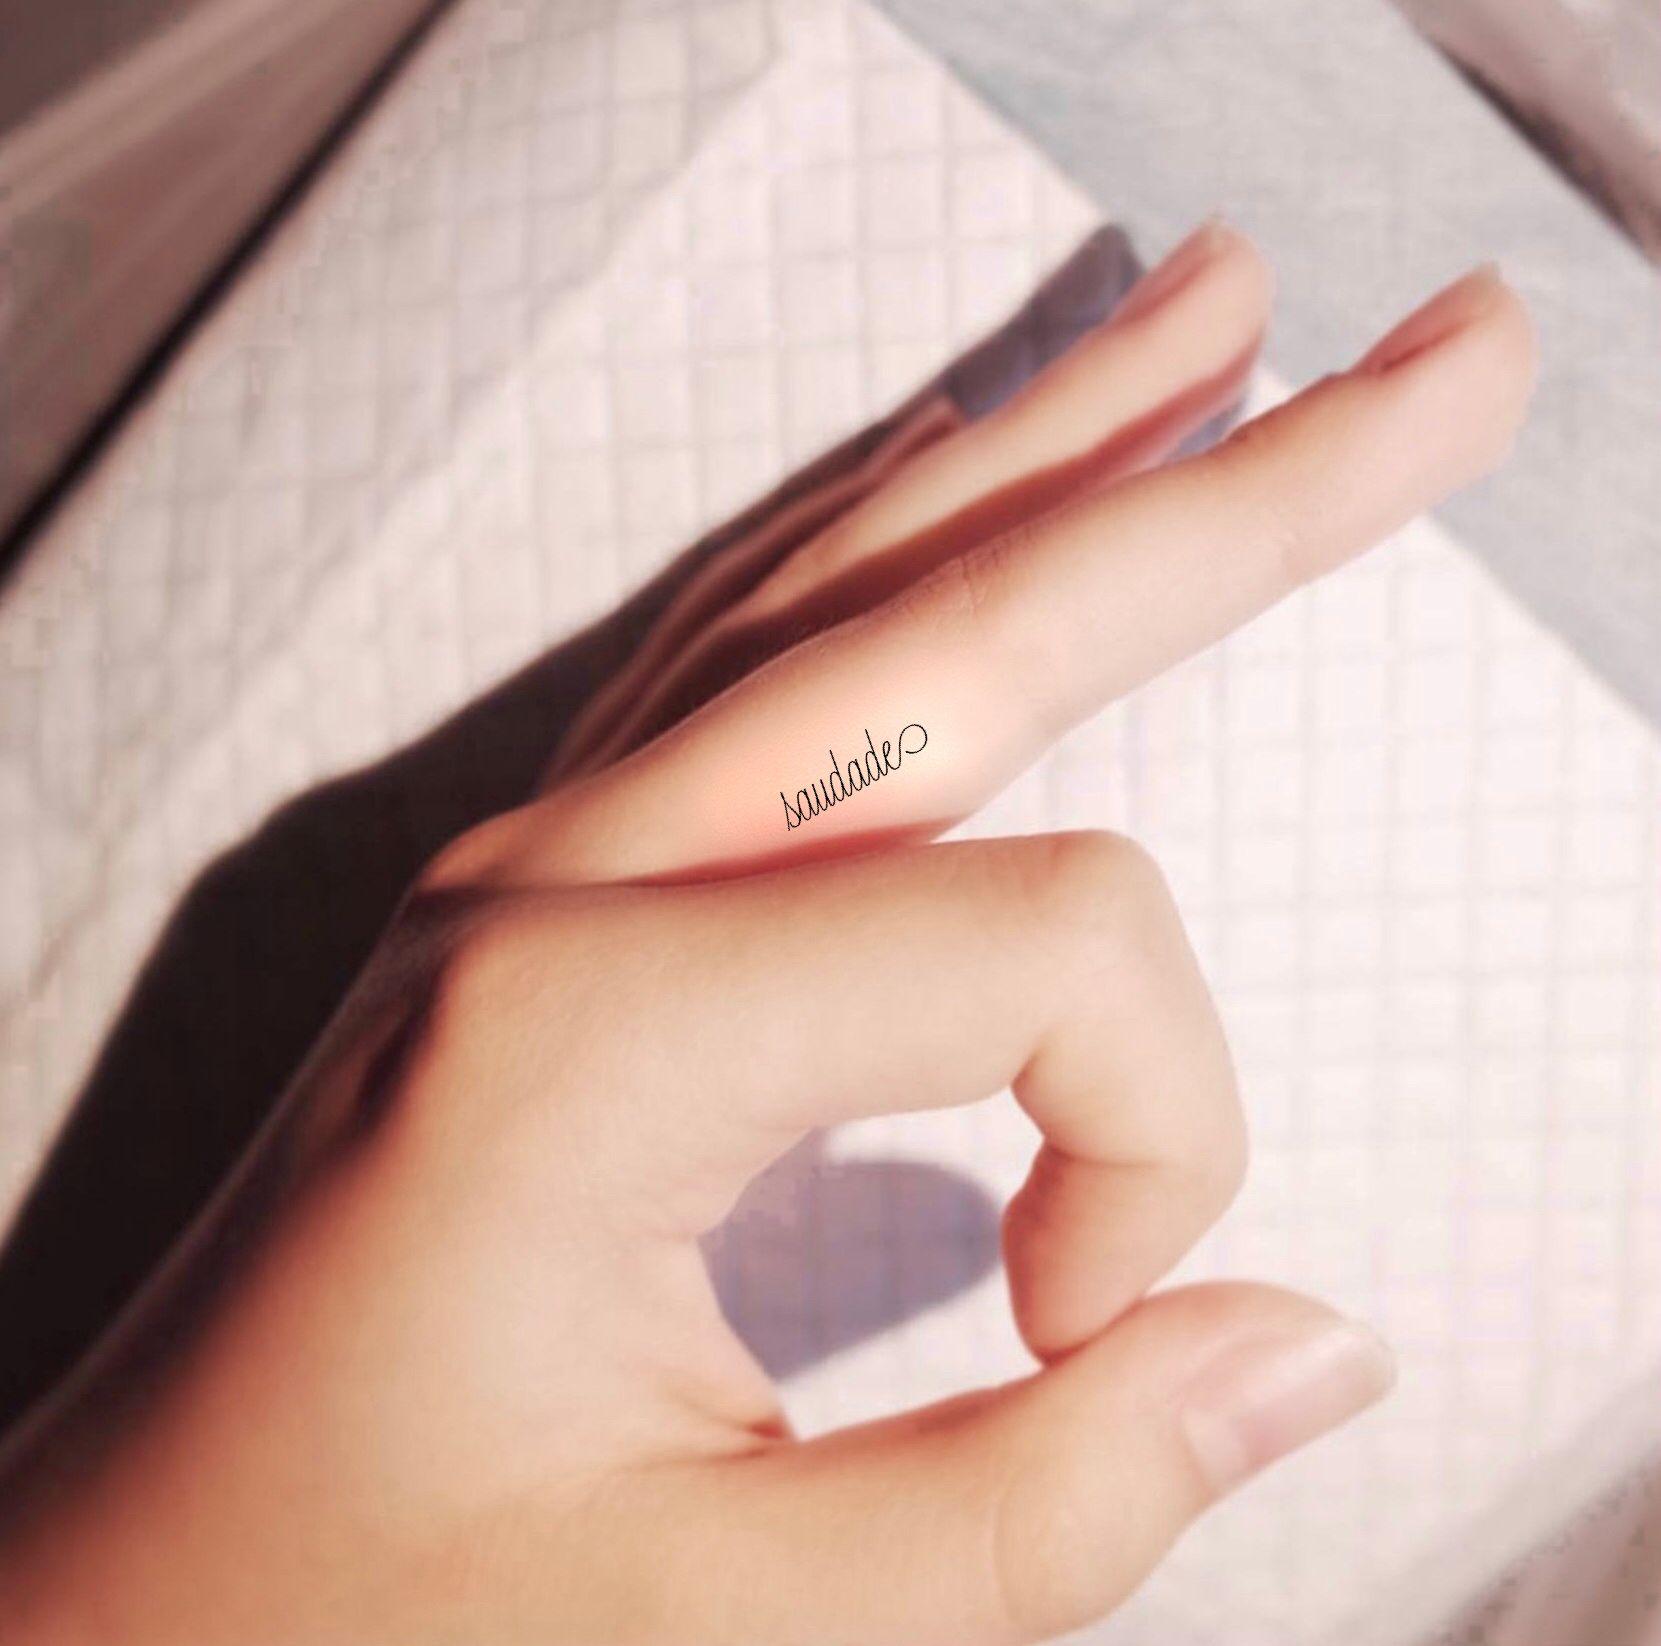 Gallery Pin by Fernanda Aki Kurihara on Tattoos Ideas   Kids initial ... is free HD wallpaper.